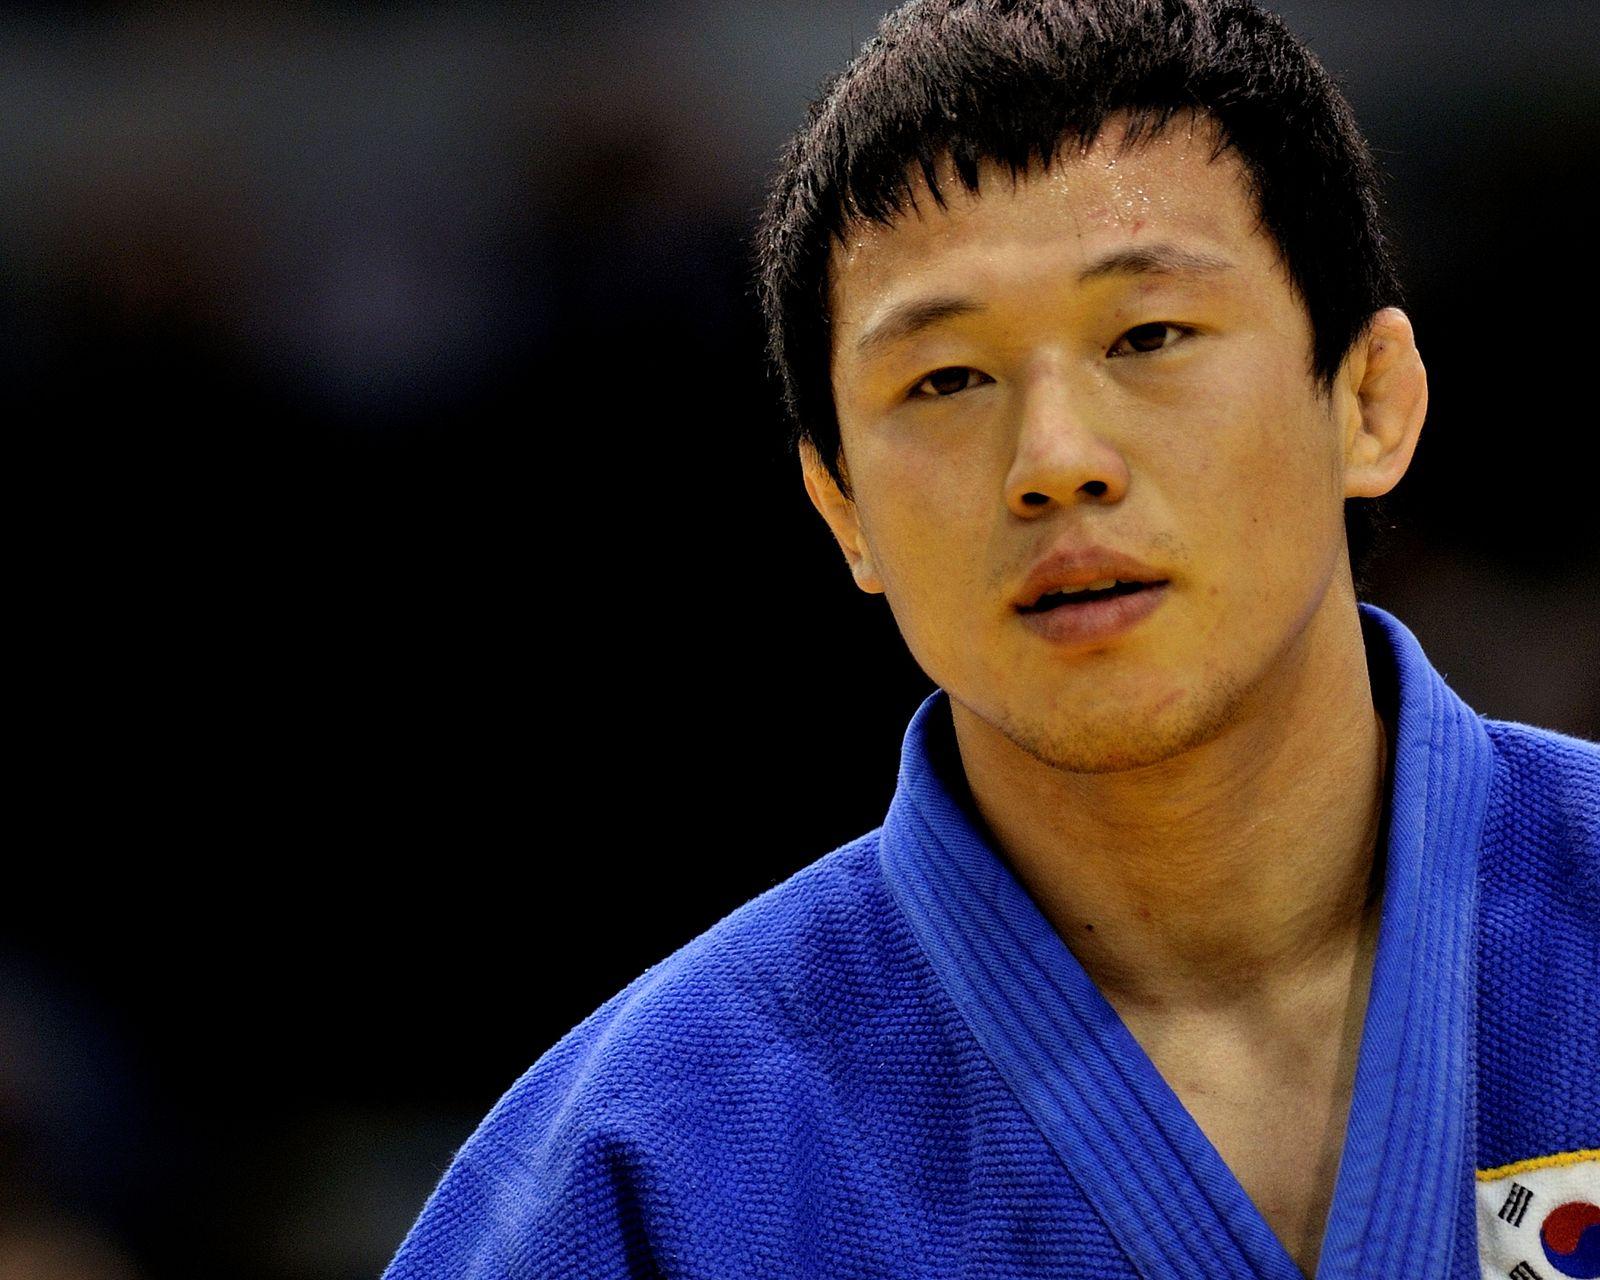 2013 Dusseldorf Judo Grand Prix 23-24 February